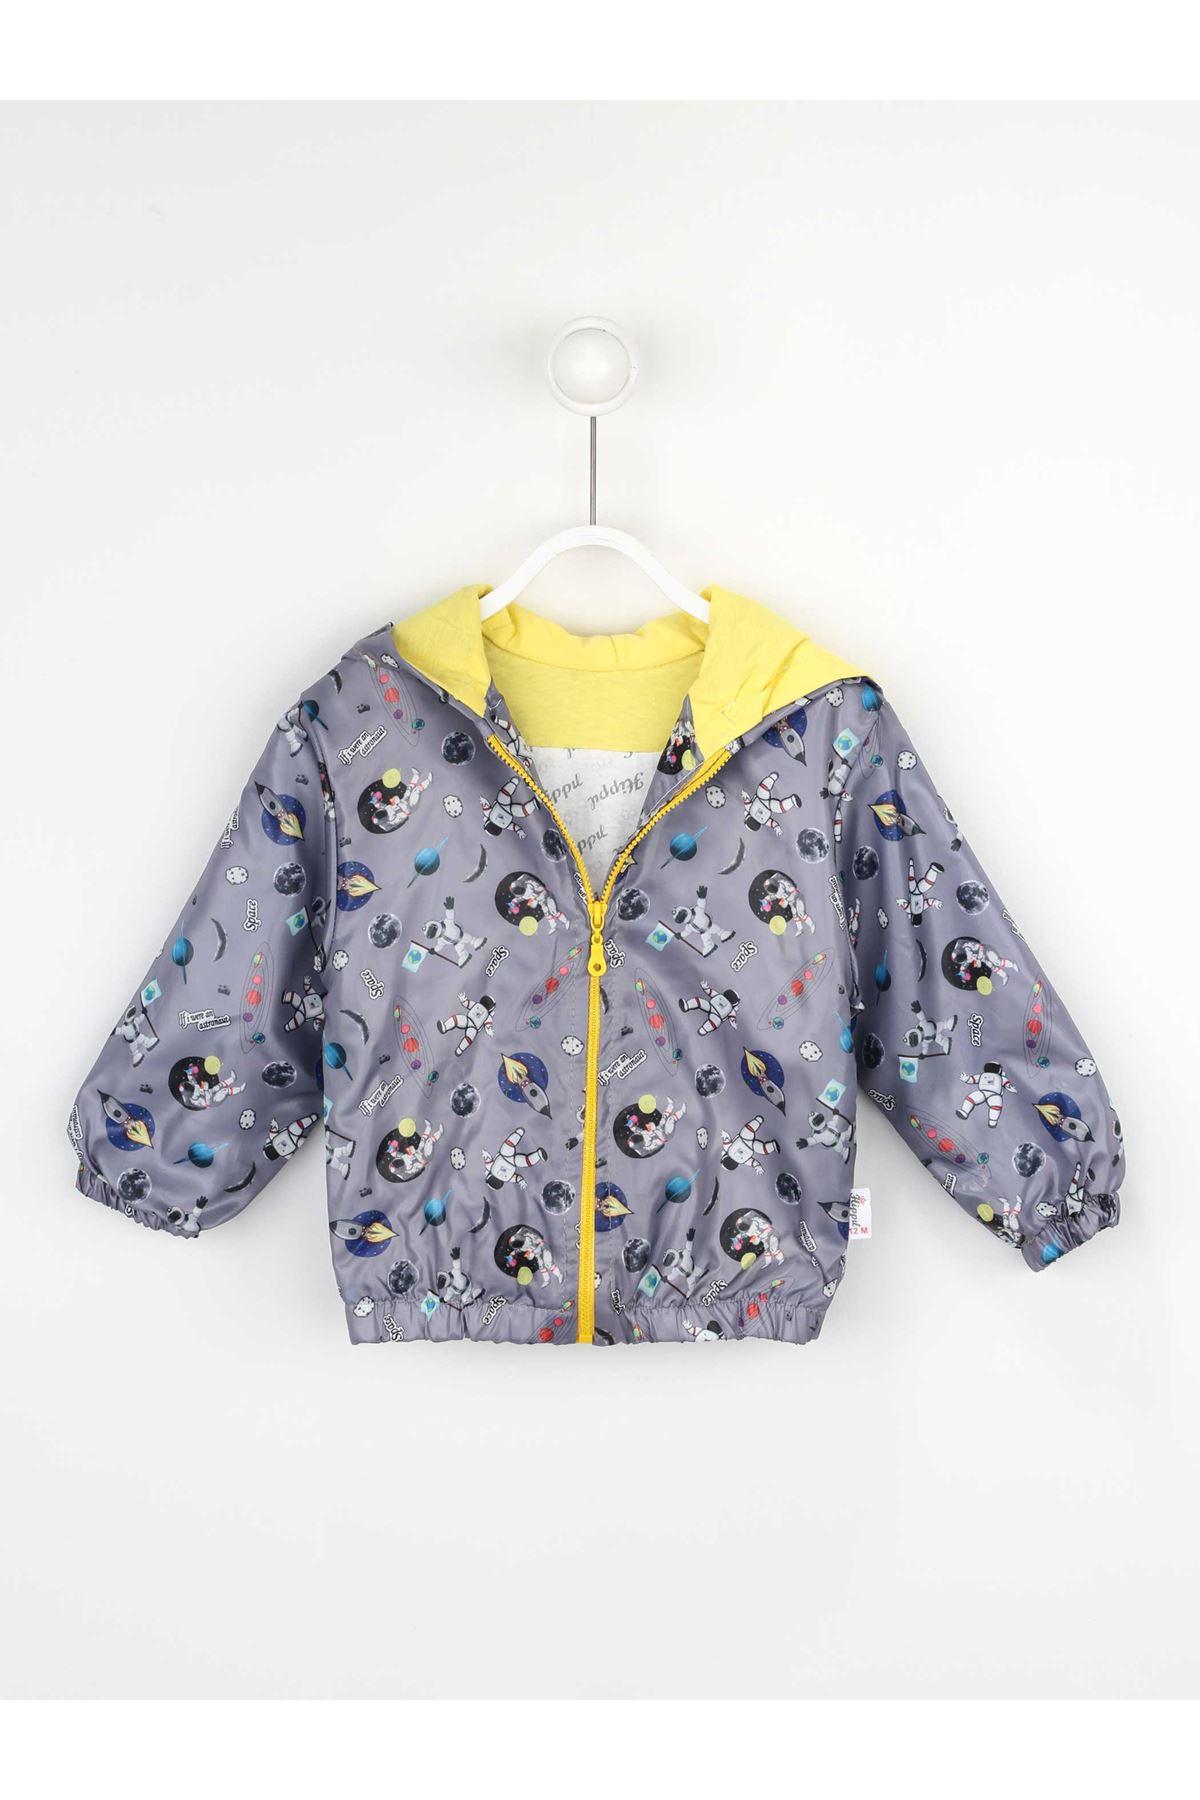 Grey Boys Children's Hooded Raincoat coats Seasonal Thin Waterproof Men Jacket Winter Rain Kids coats models